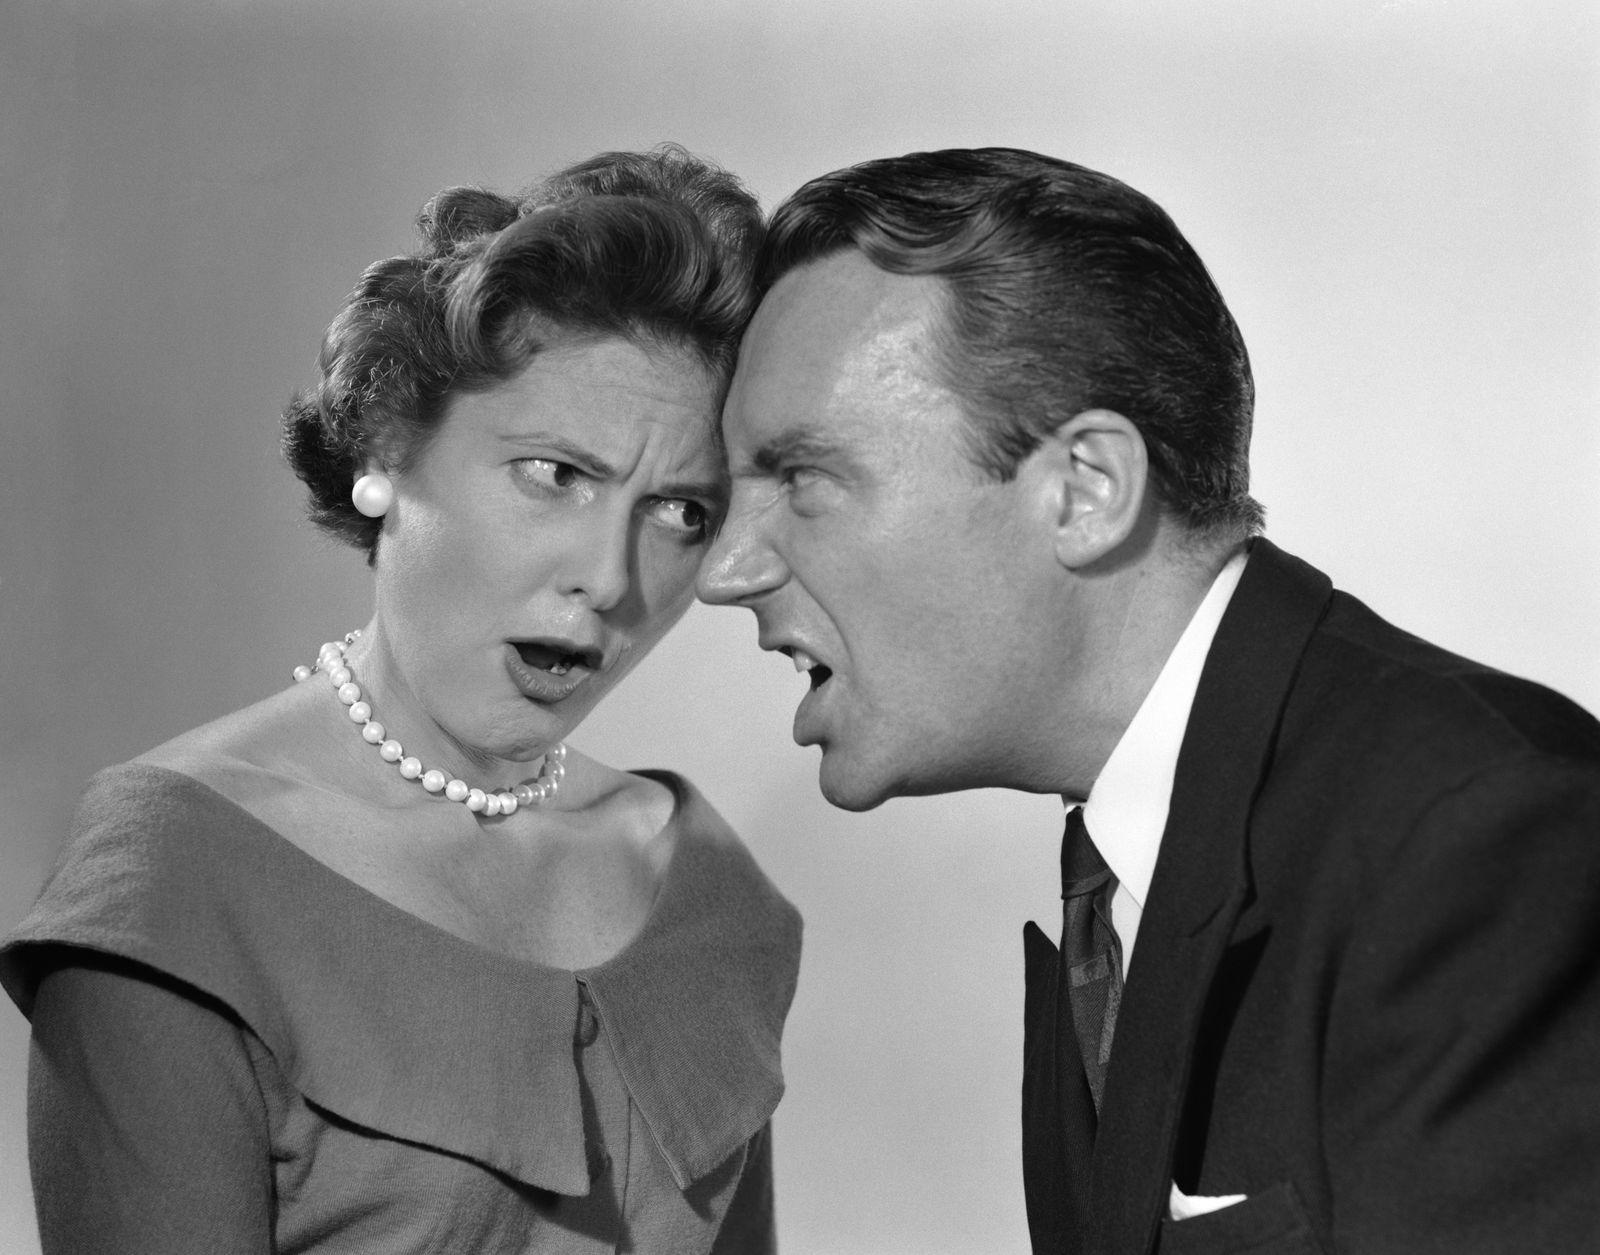 1950s ARGUING COUPLE...